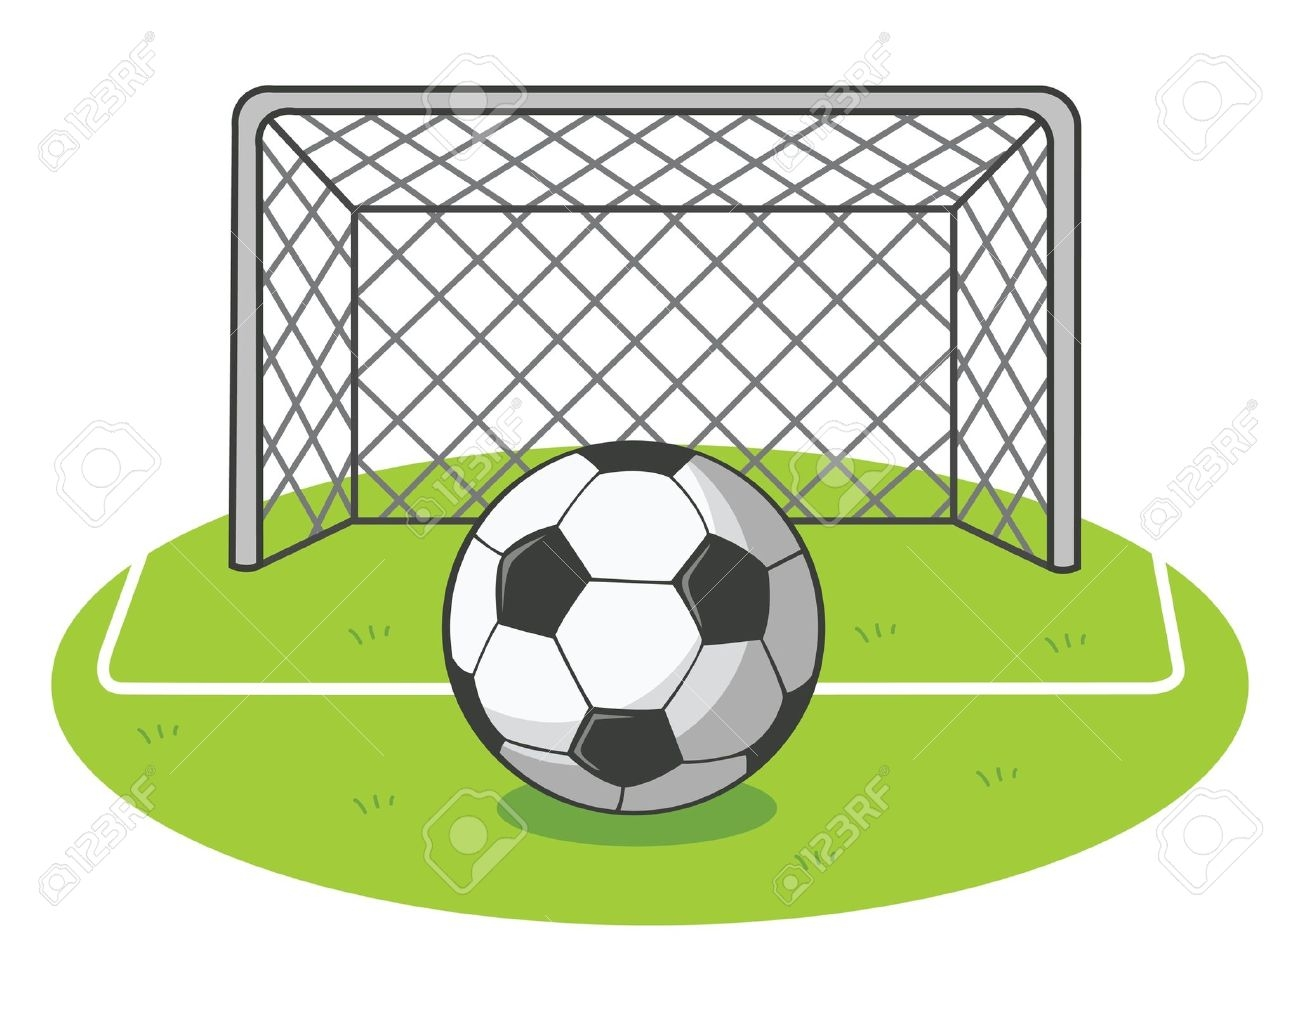 Luxury soccer wallpaper download. Goal clipart